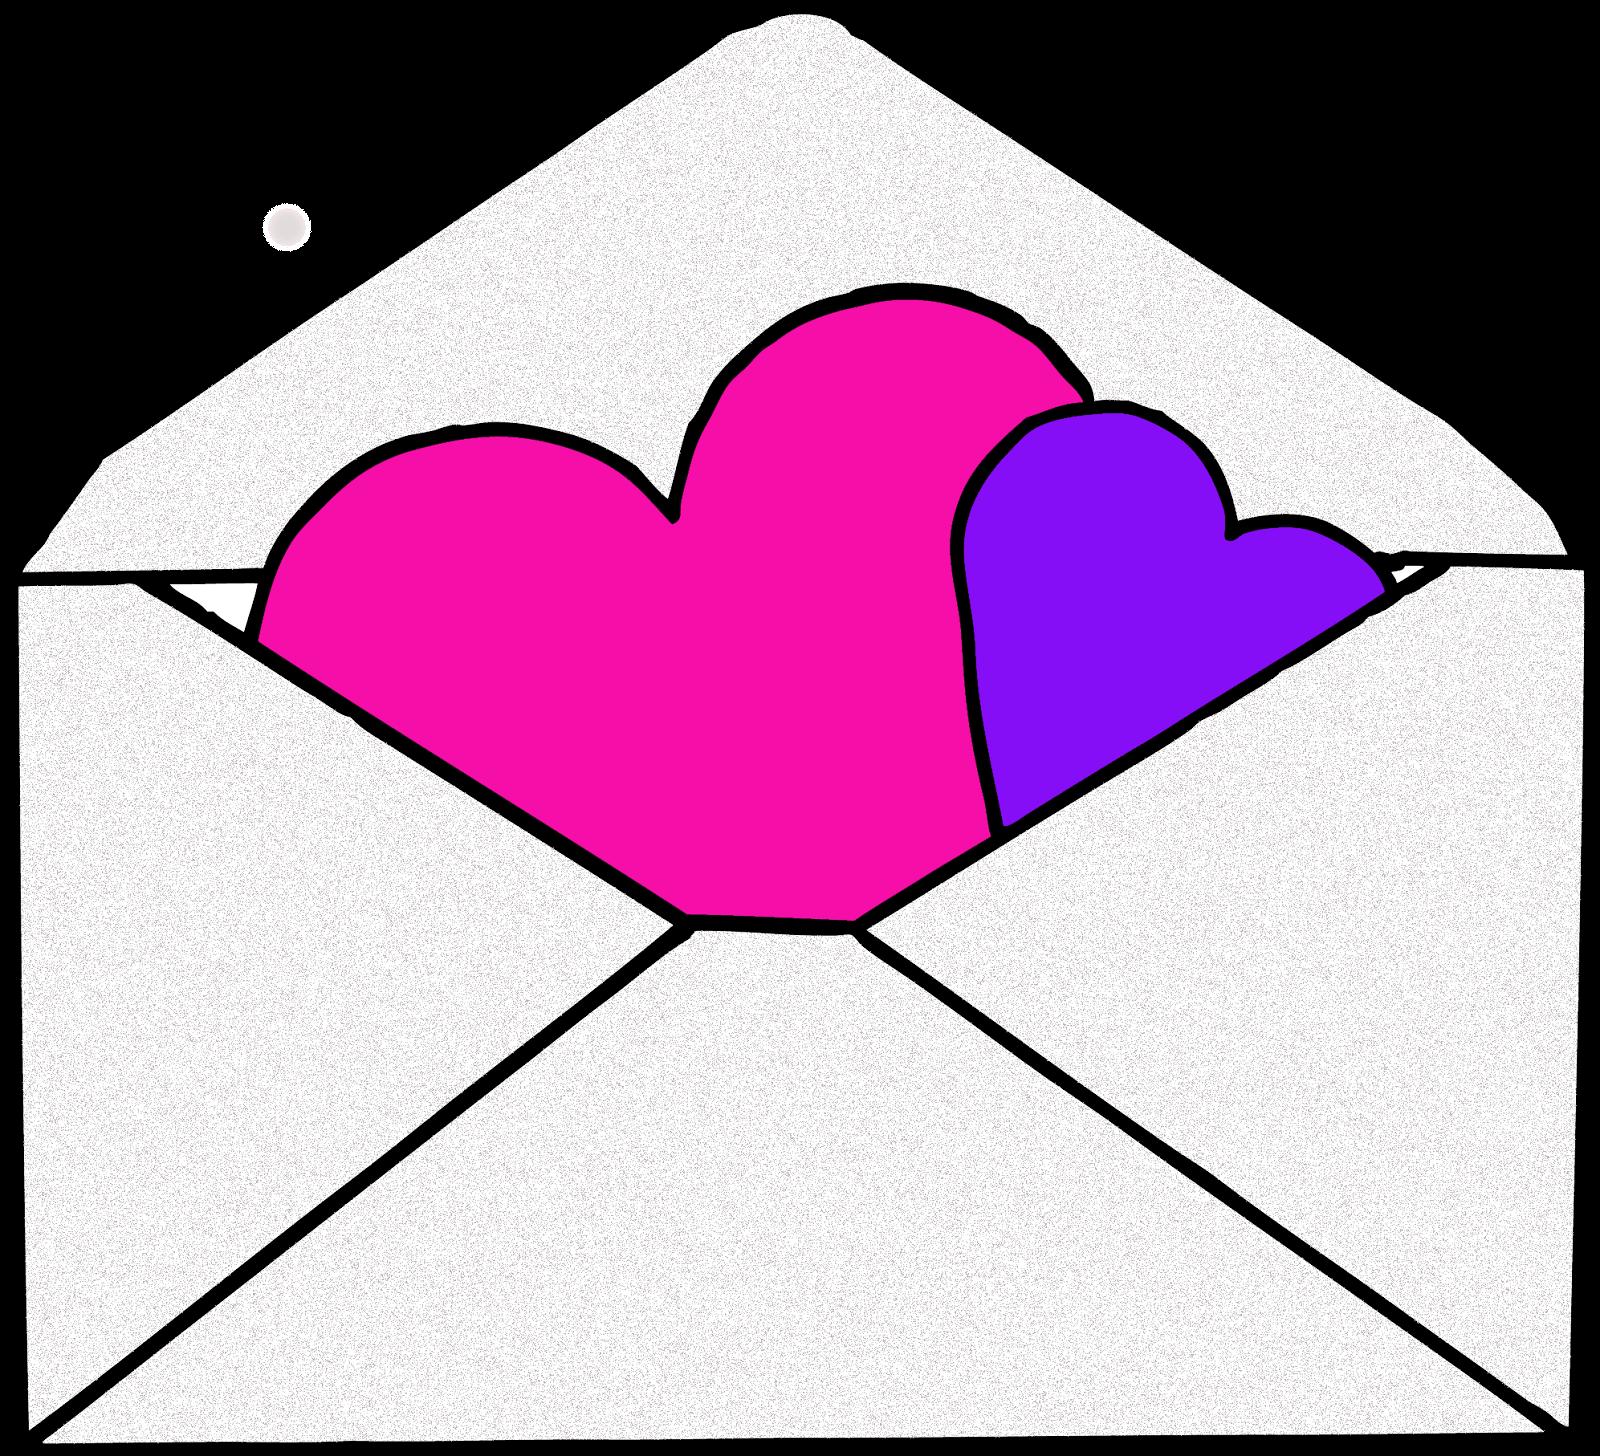 Bail group house cliparts. Envelope clipart envelope outline